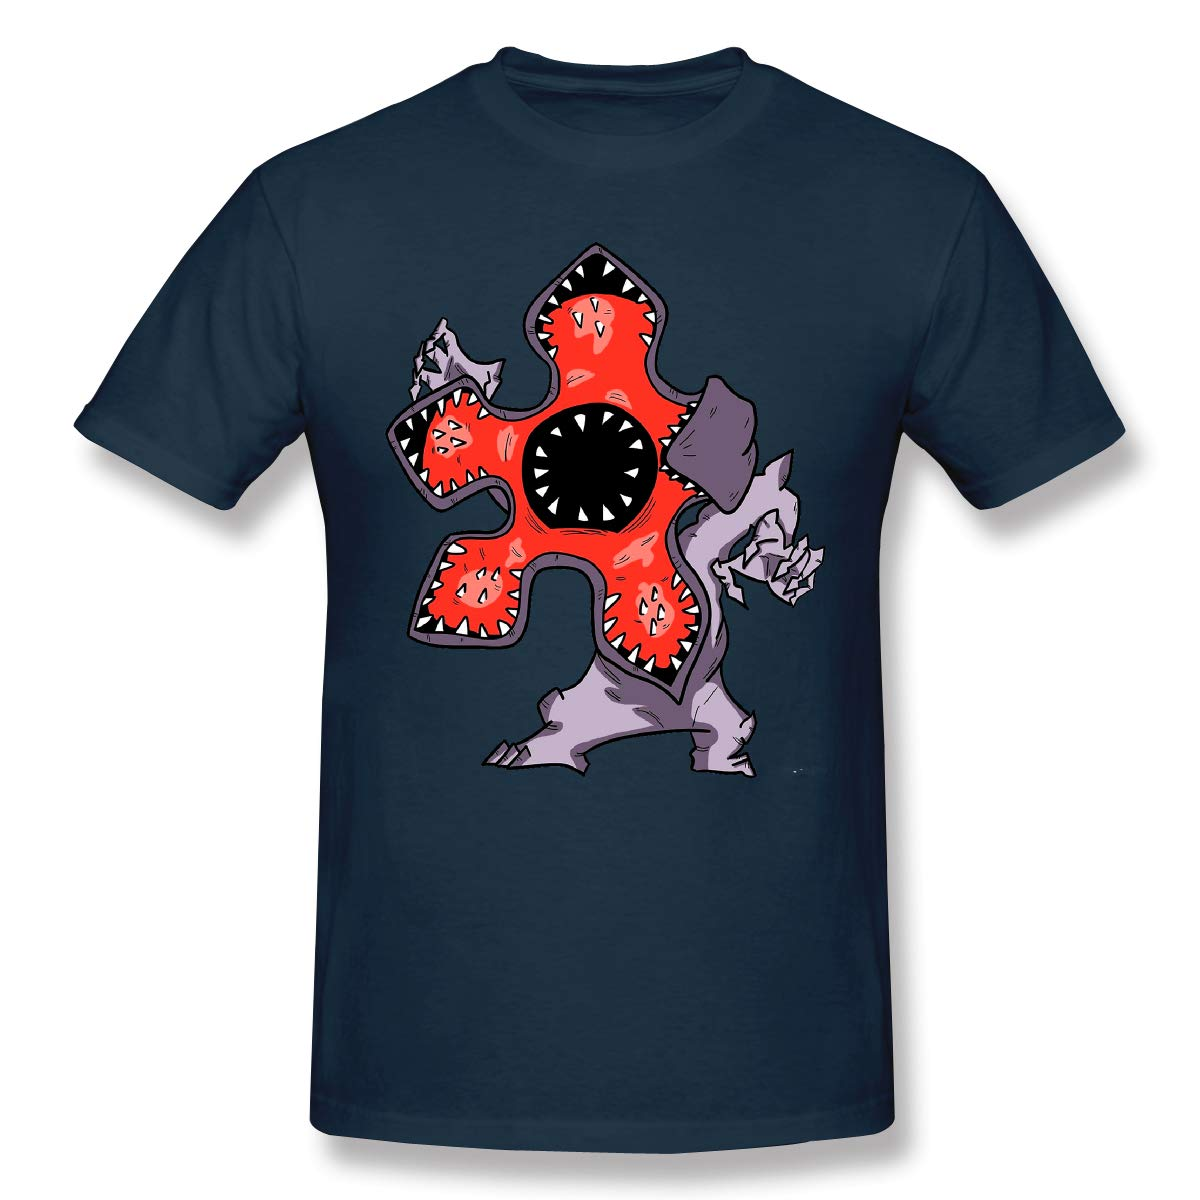 Gallagher Demogorgon Casual T Shirt Short Sleeve Tee For